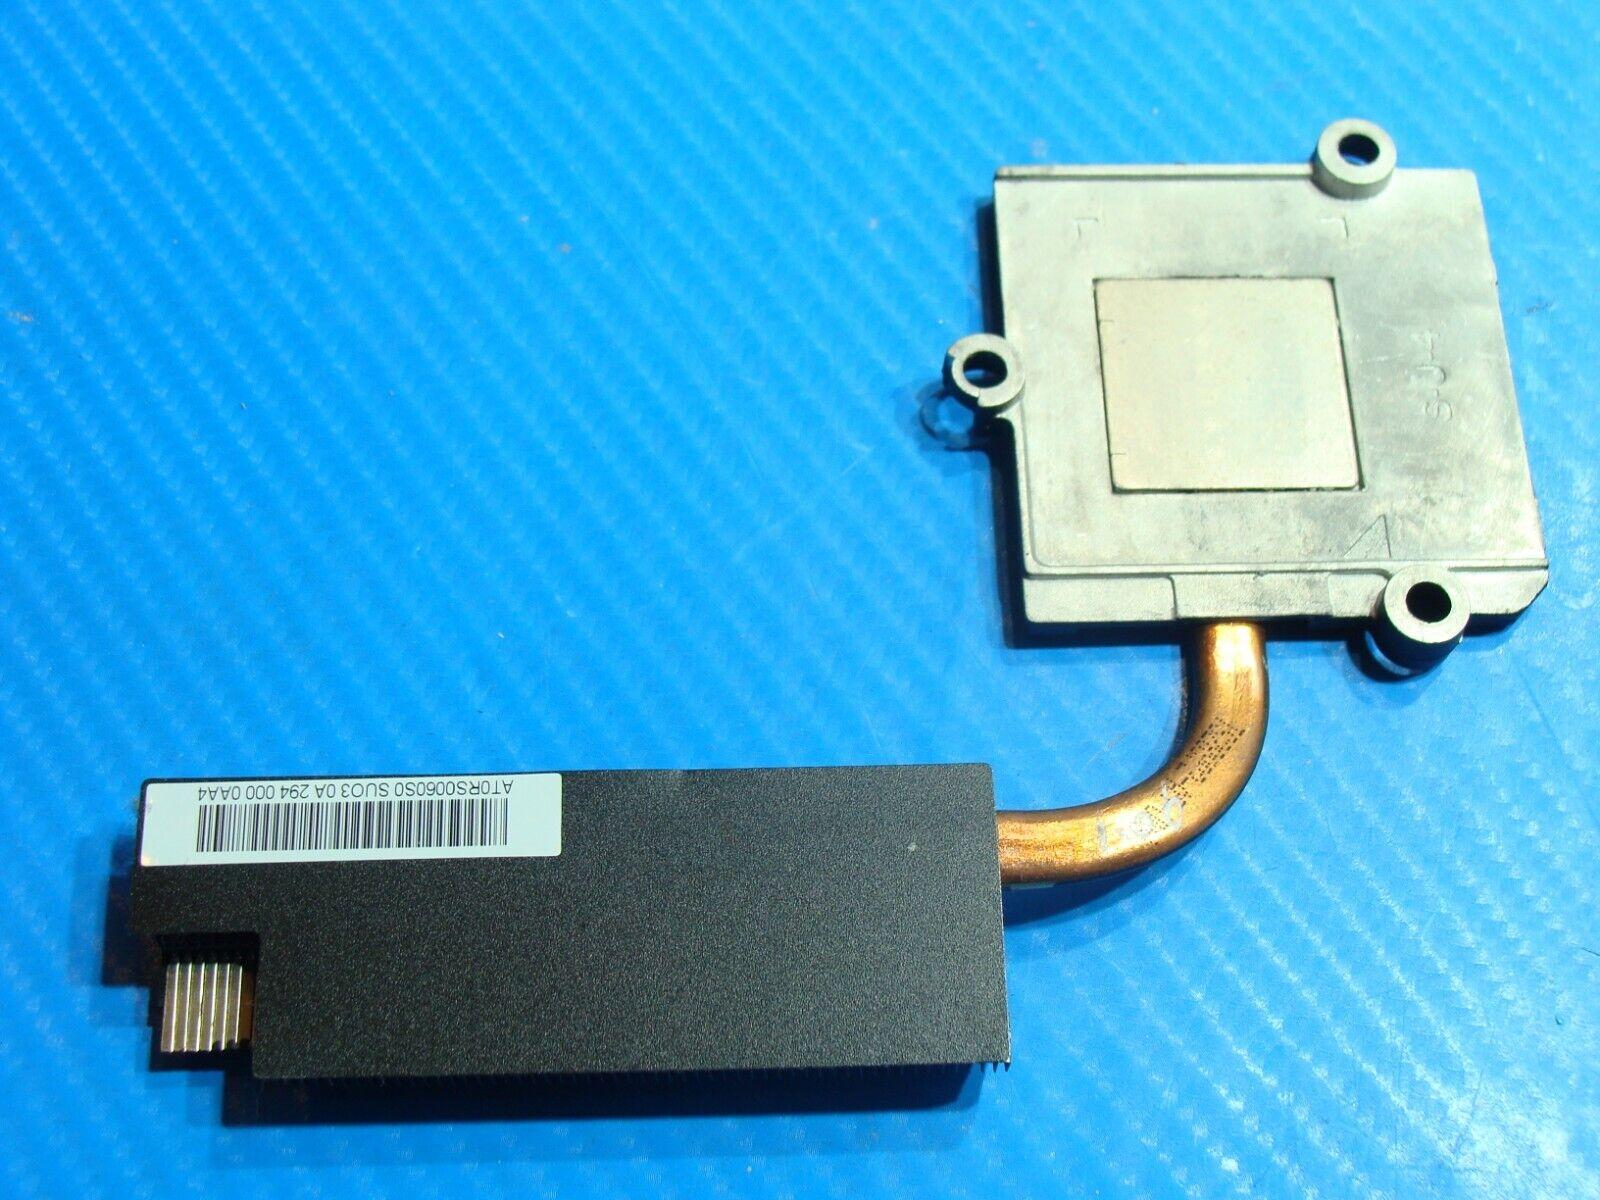 Samsung Series 3 NP350V5C 15.6